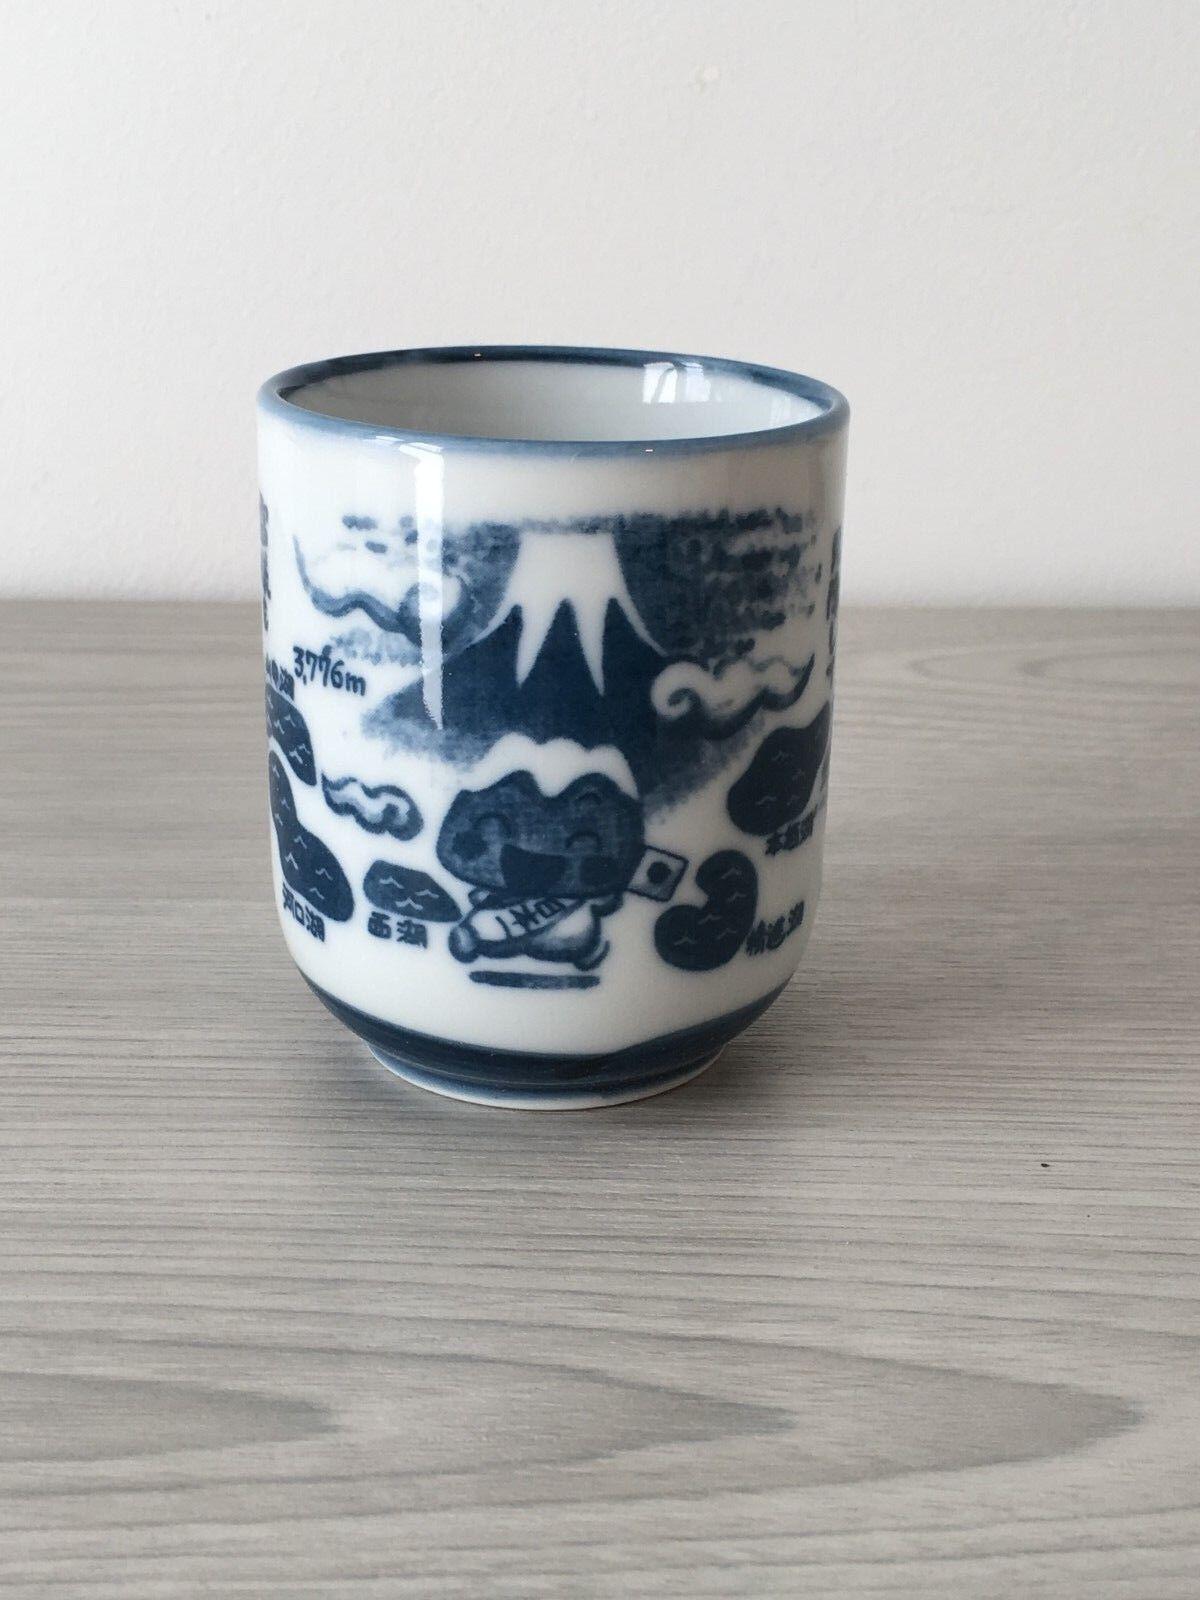 New Box Japanese Mount Fuji Fuji Fuji Mountain Ceramic Tea Cup Glass Mug Japan Gift 430d38